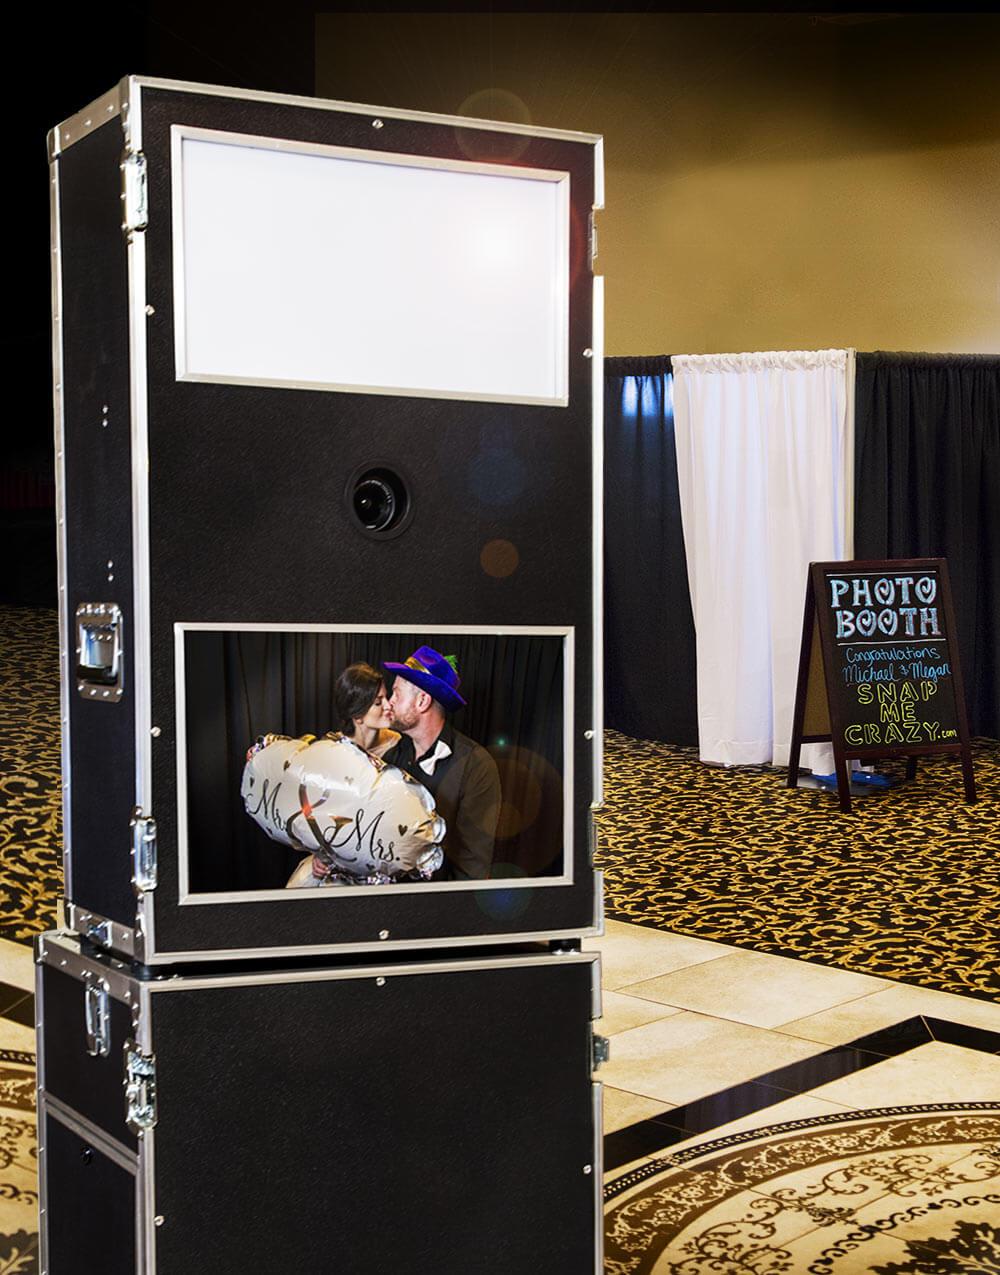 Oklahoma City snap me crazy photo booth rental